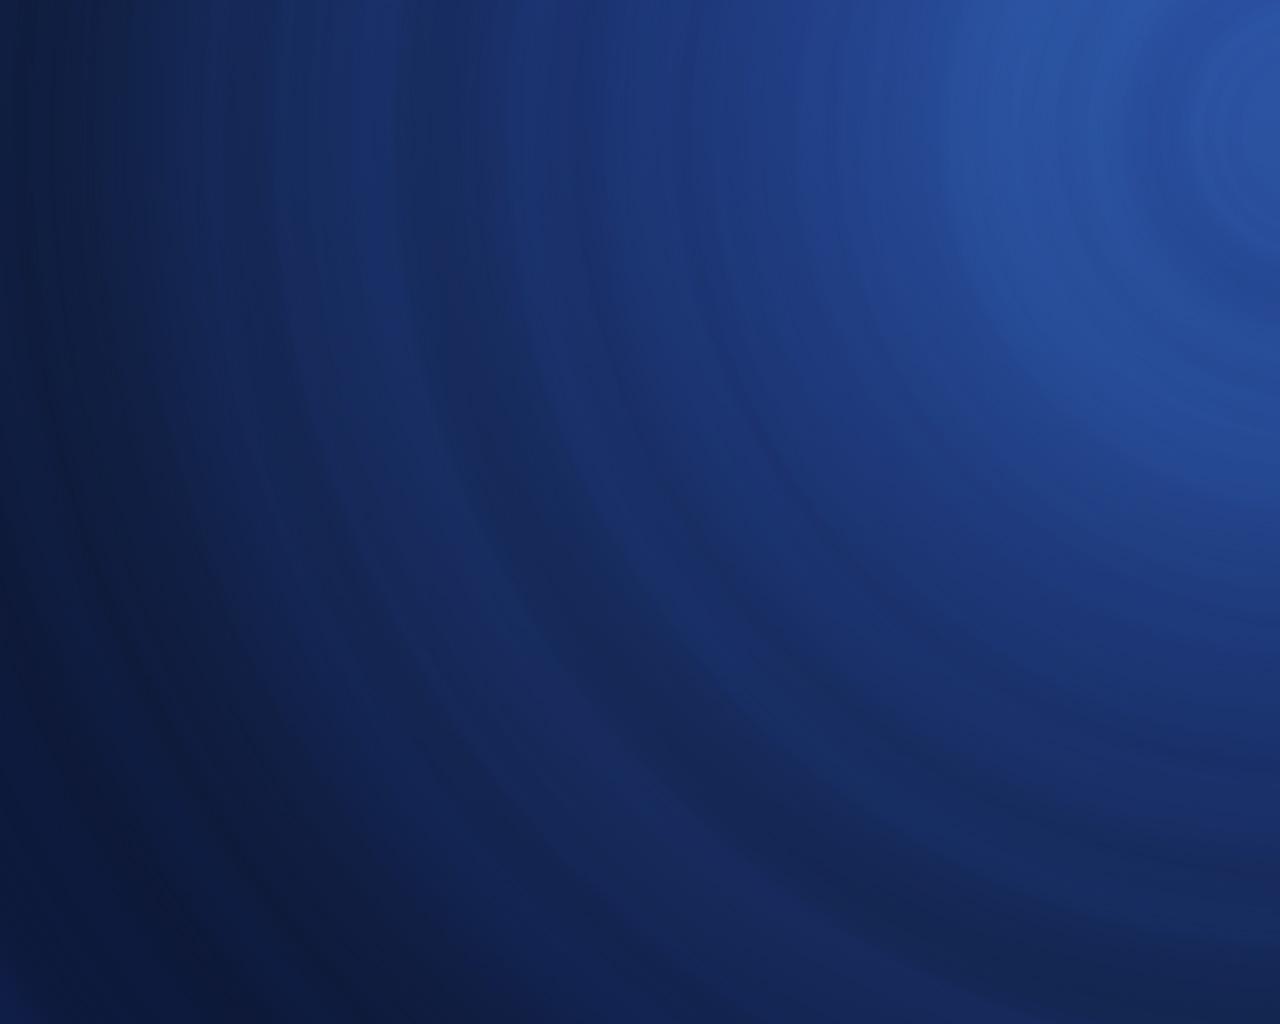 Plain Blue Backgrounds Wallpaper Hd 1280x1024